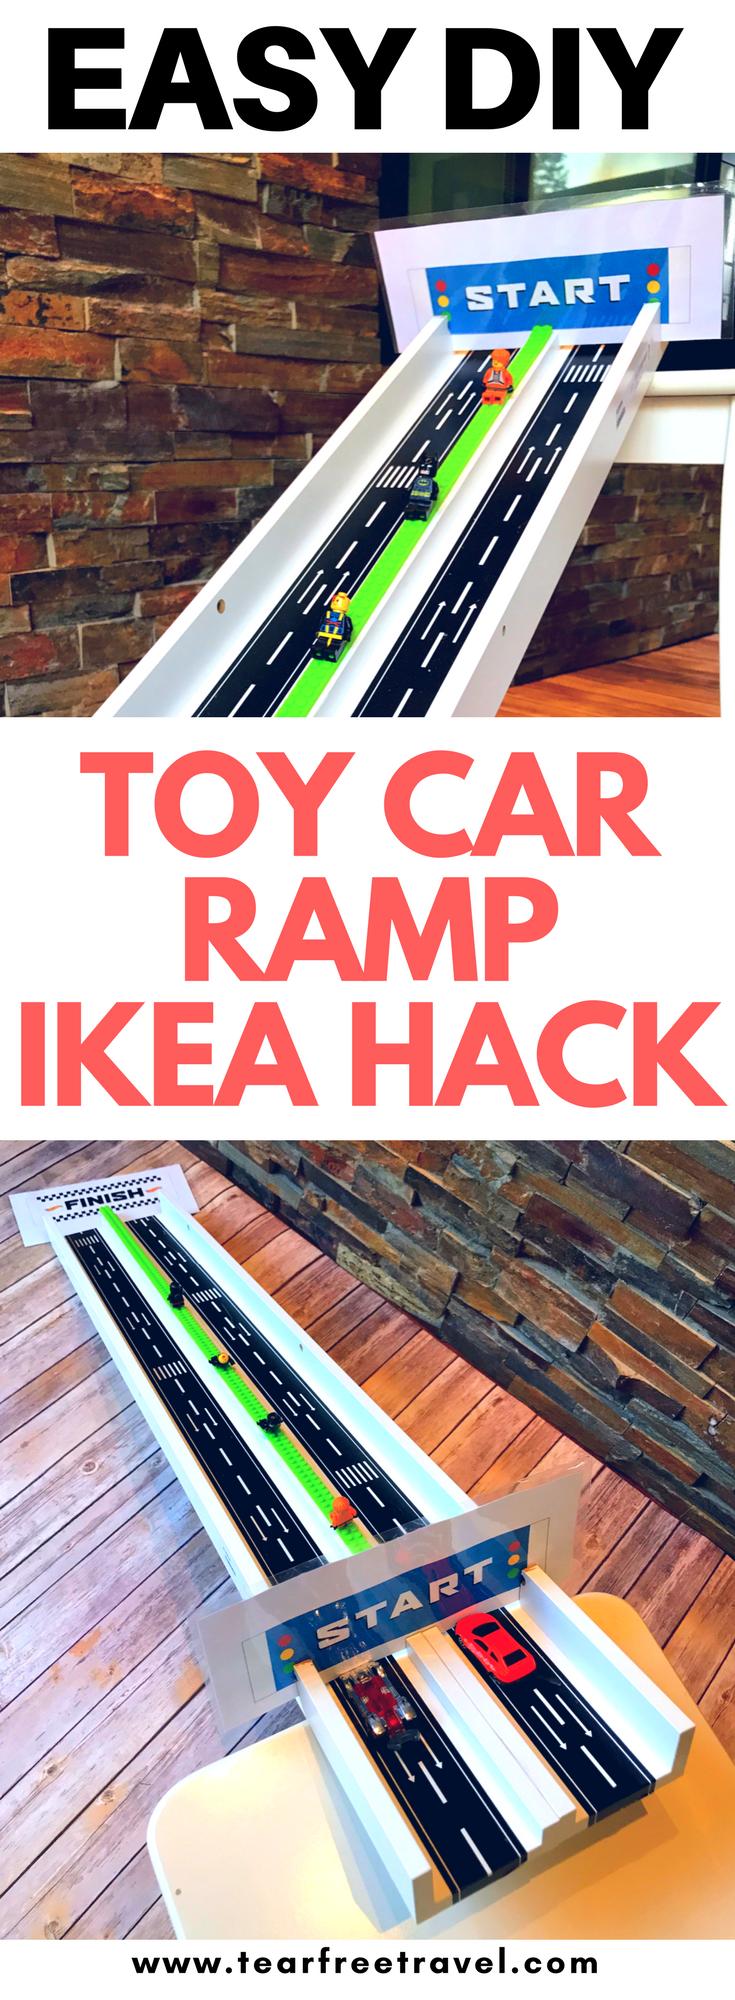 Ikea Hack Diy Toy Car Ramp Diy Toys Car Car Ramps Diy For Kids